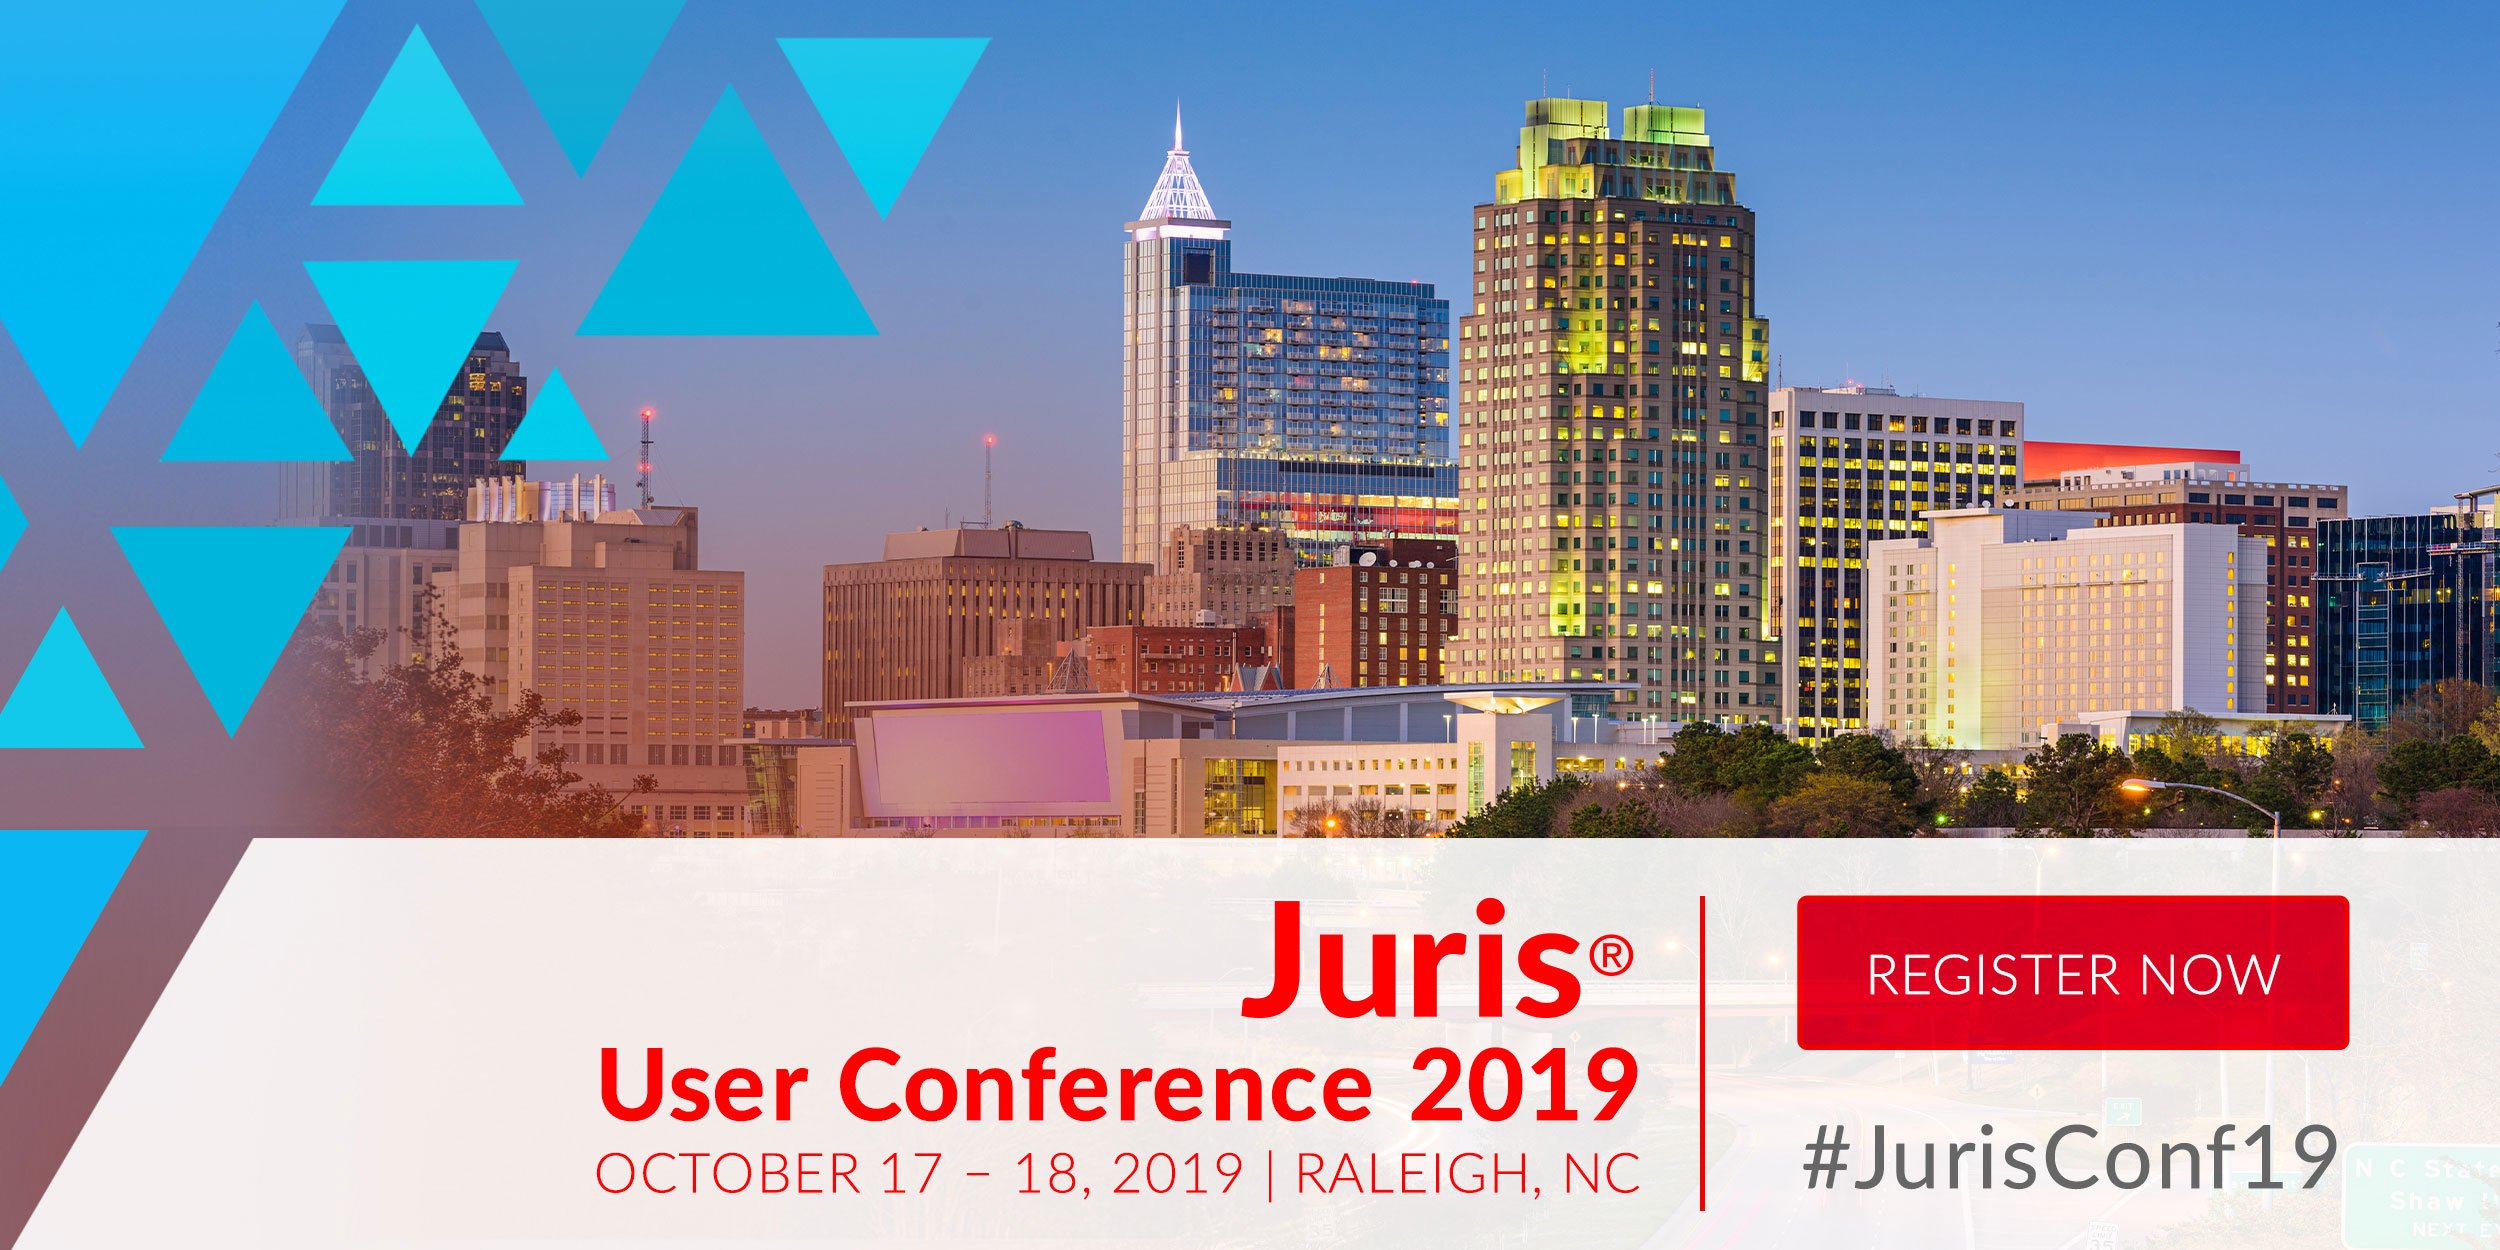 001452_Juris_User_Conference_2019_Website_2500x1250-(1)